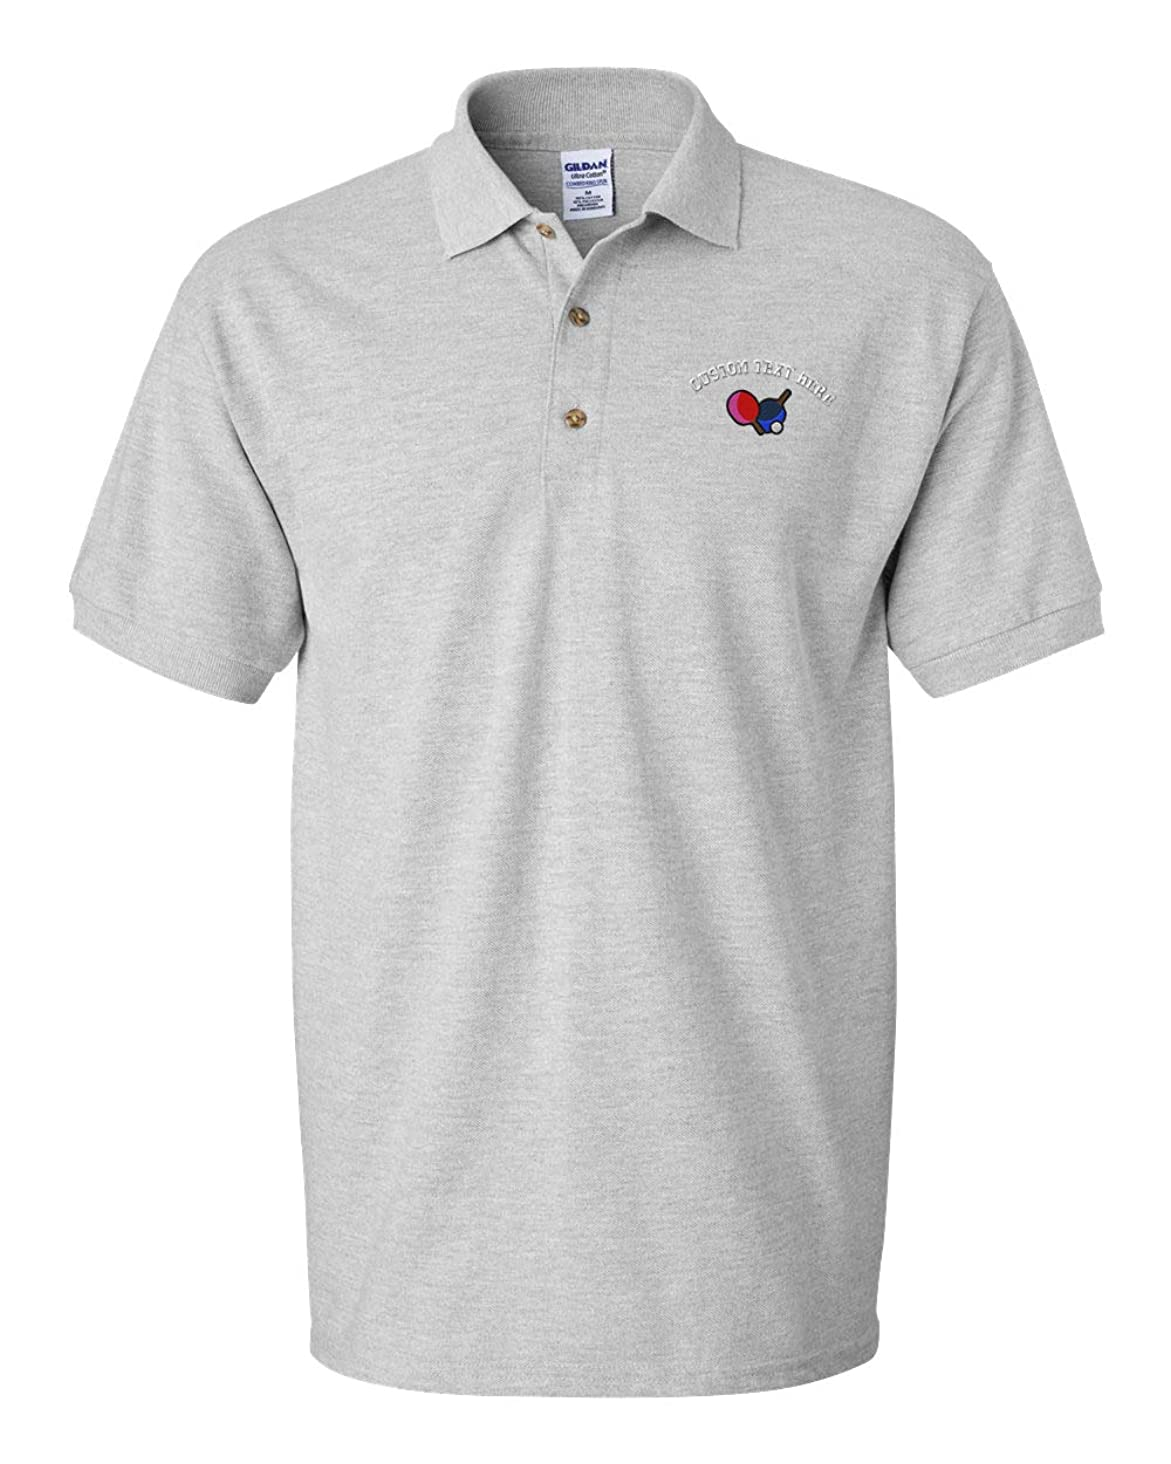 Custom Text Embroidered Table Tennis Men's Short Sleeve Cotton Polo Golf Shirt